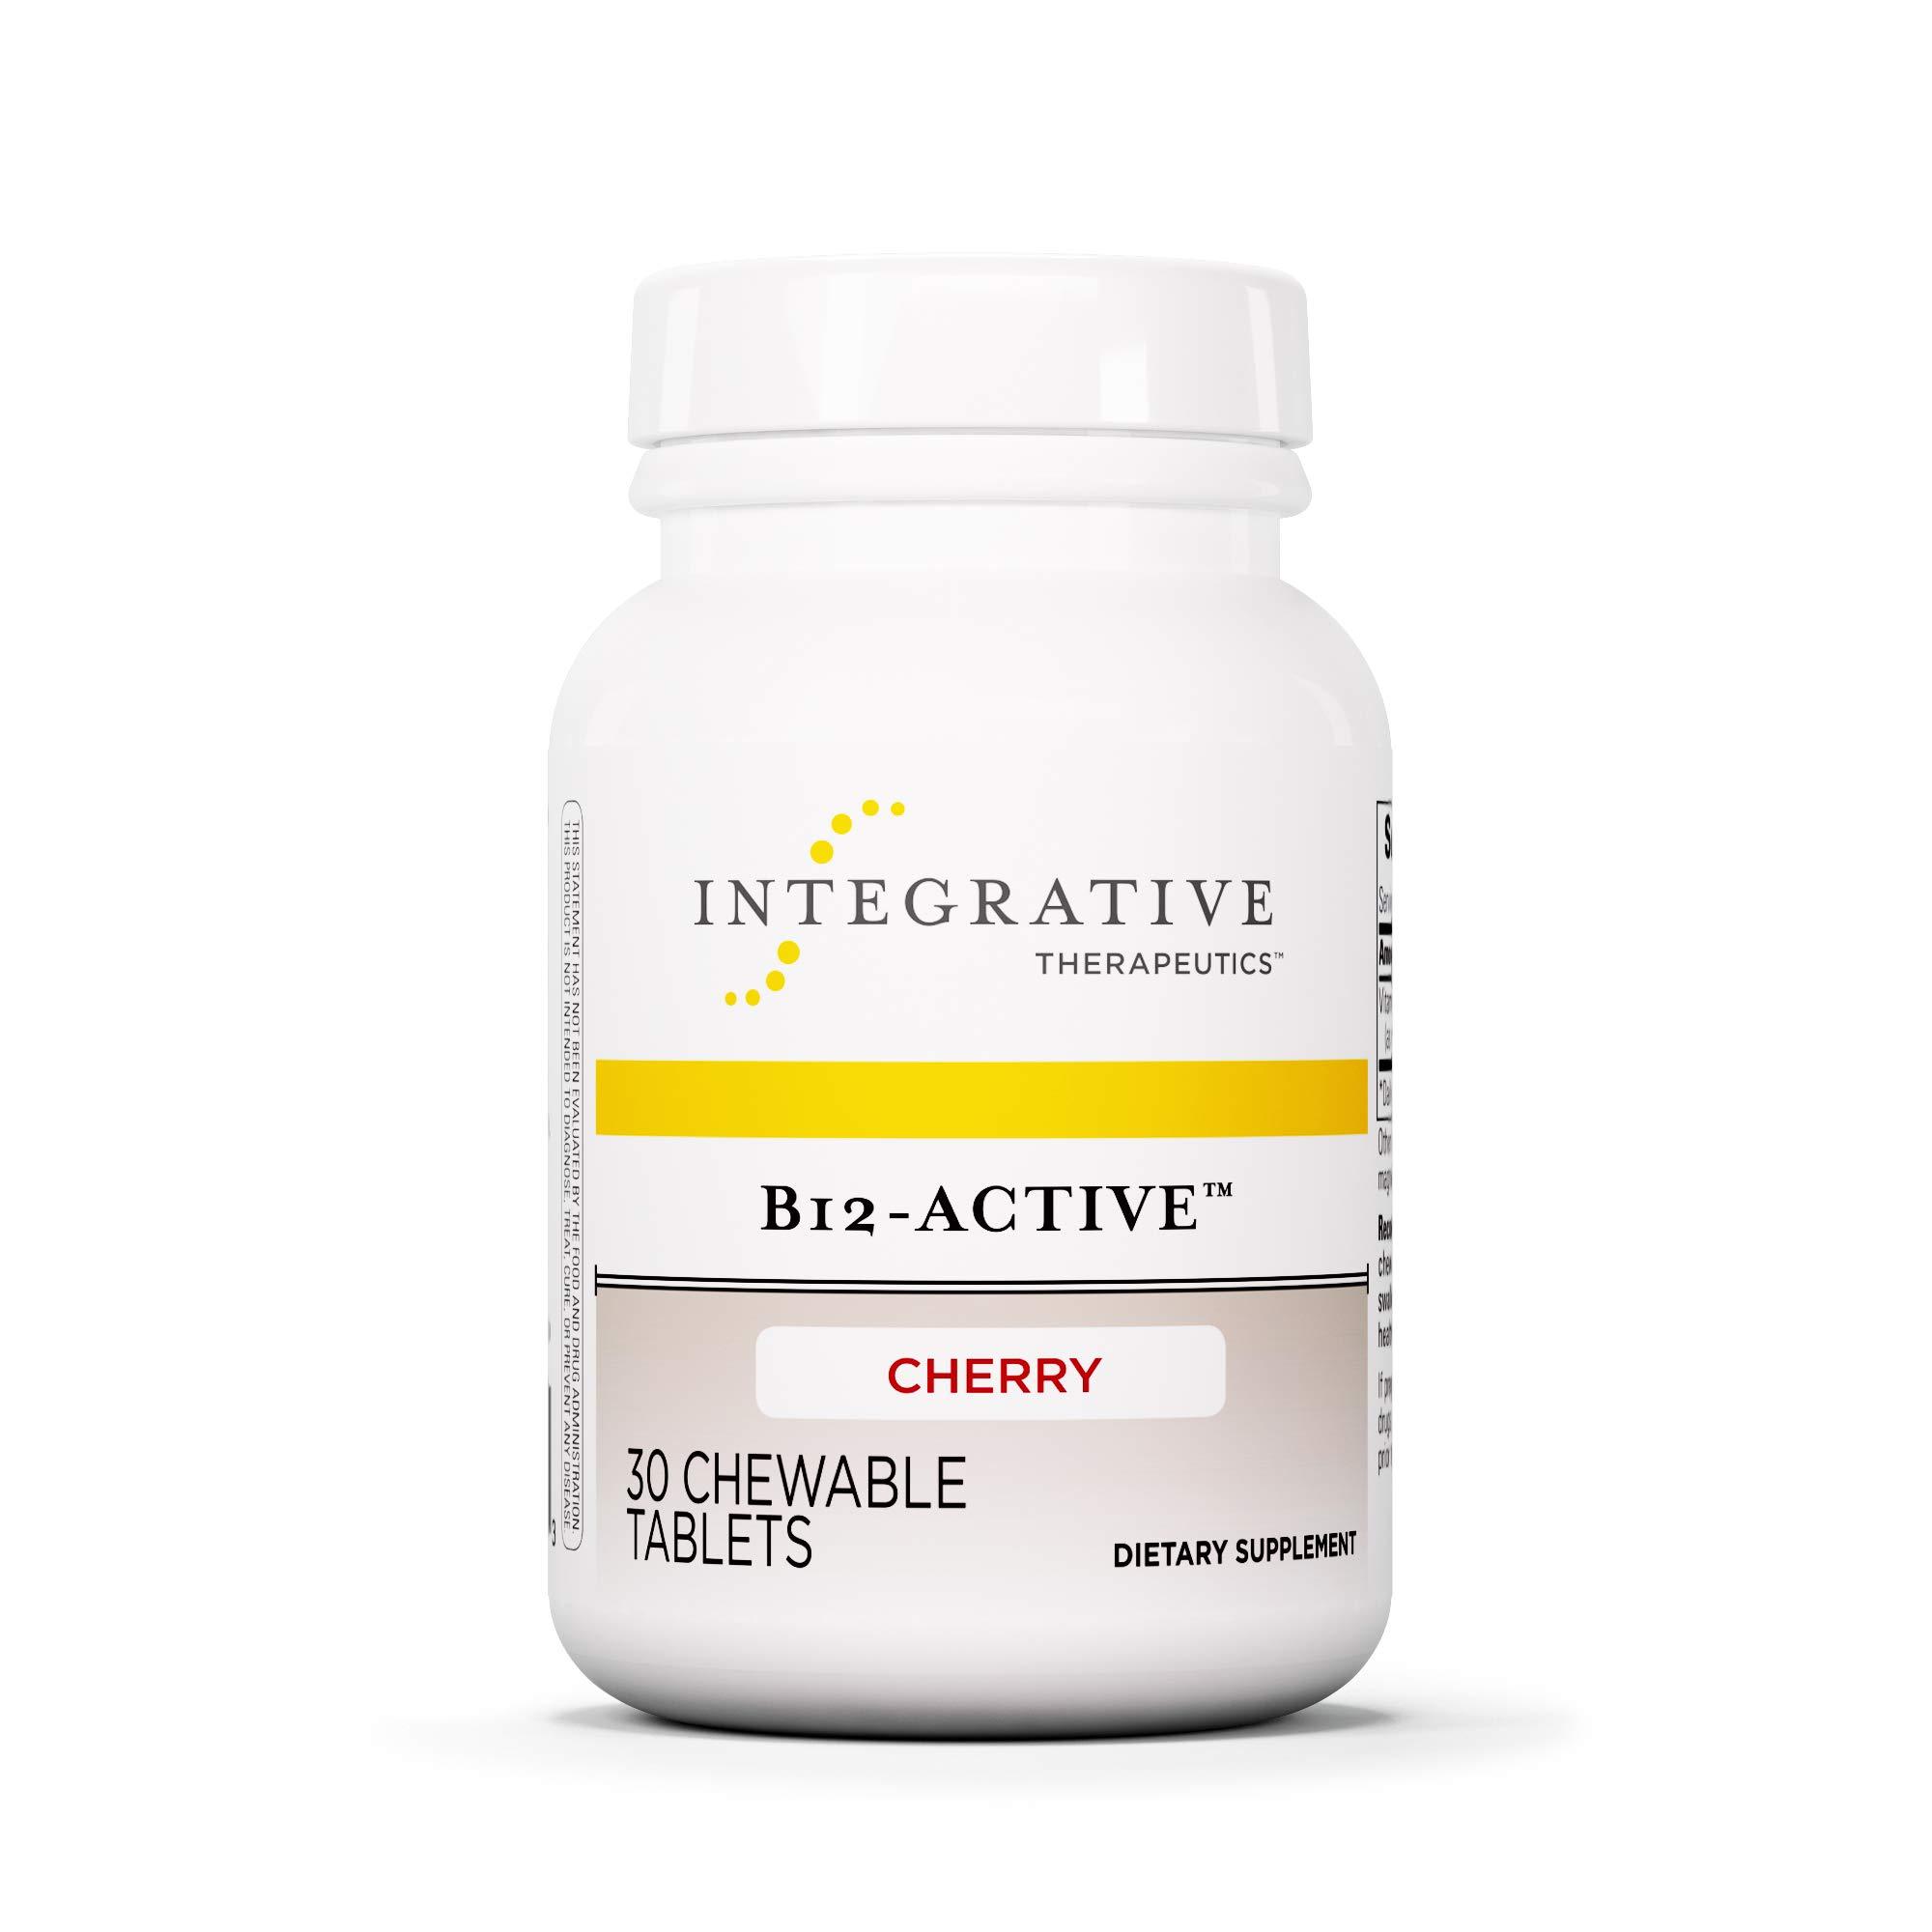 Methylcobalamin Form Of B12 Side Effects